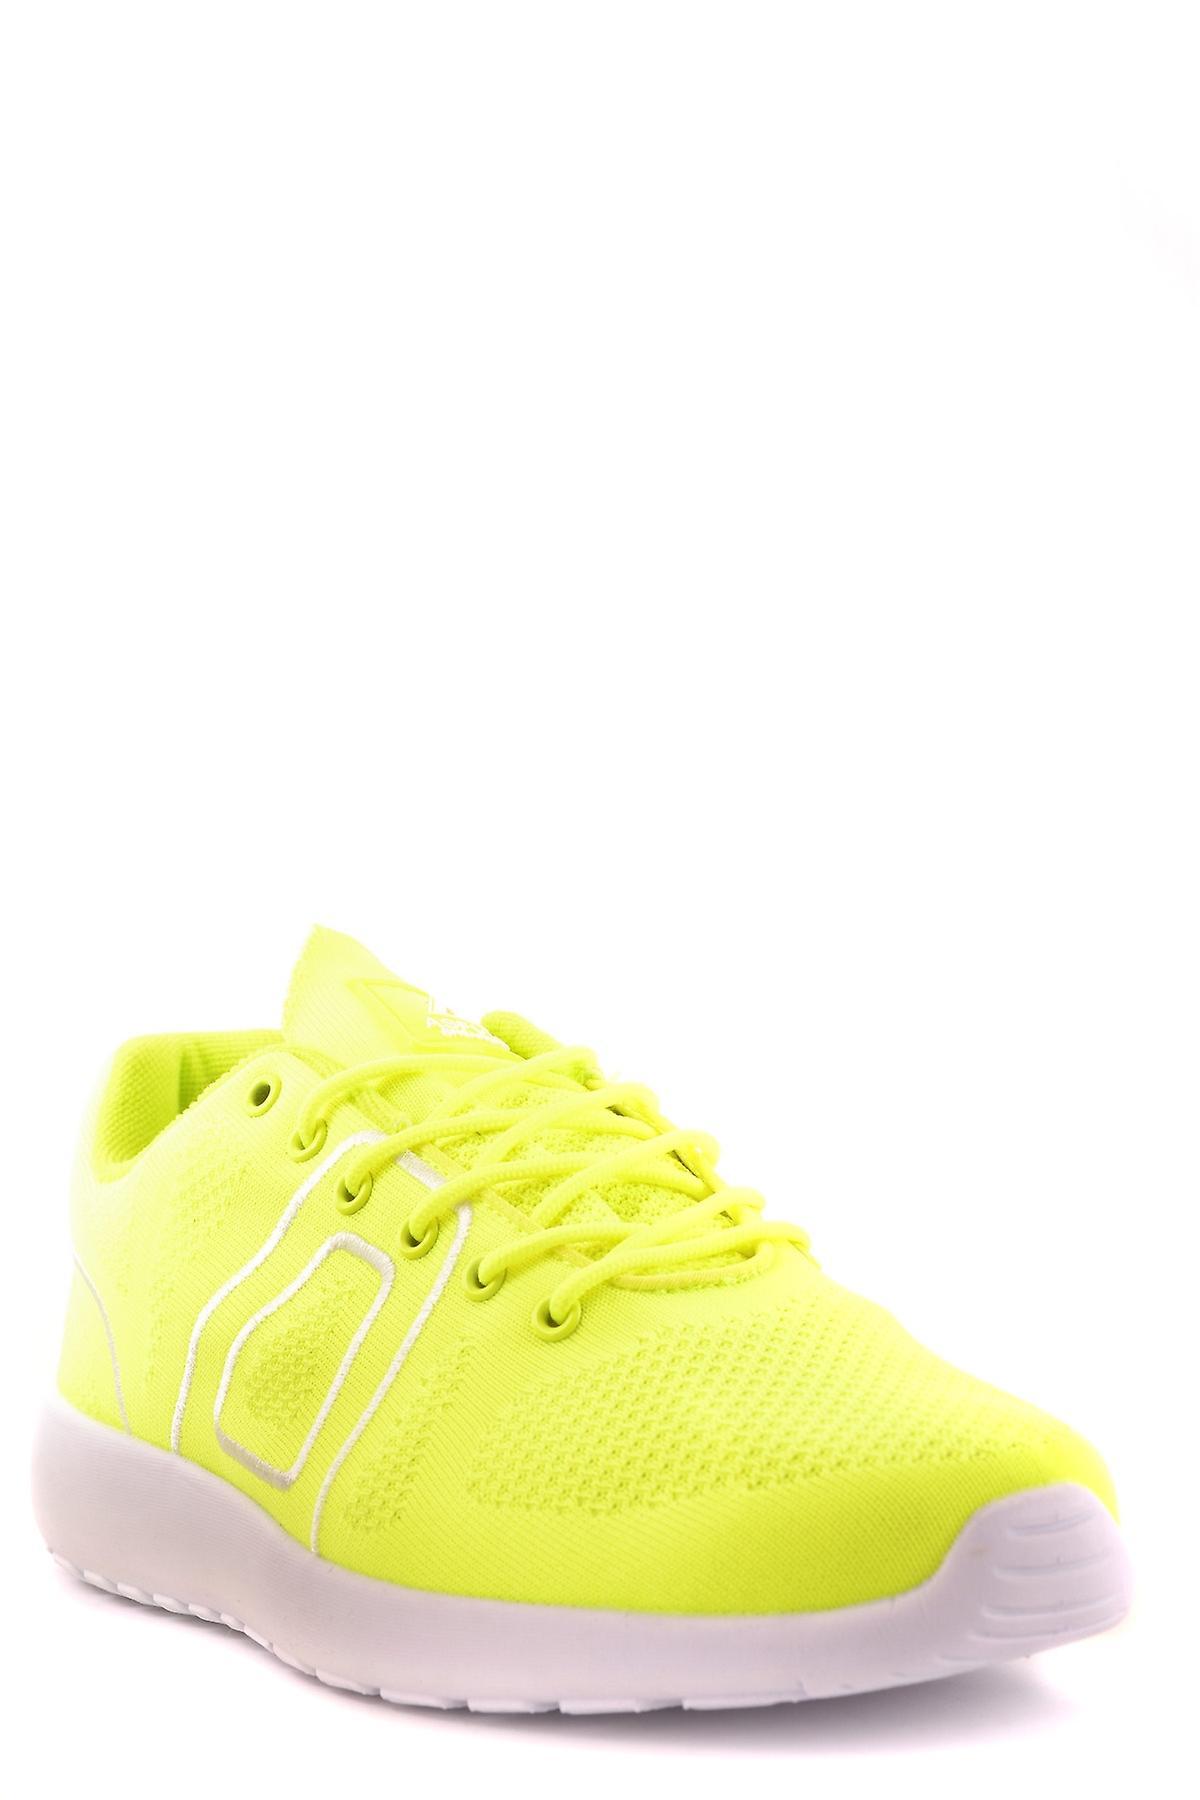 Asfvlt Ezbc205008 Baskets en tissu jaune